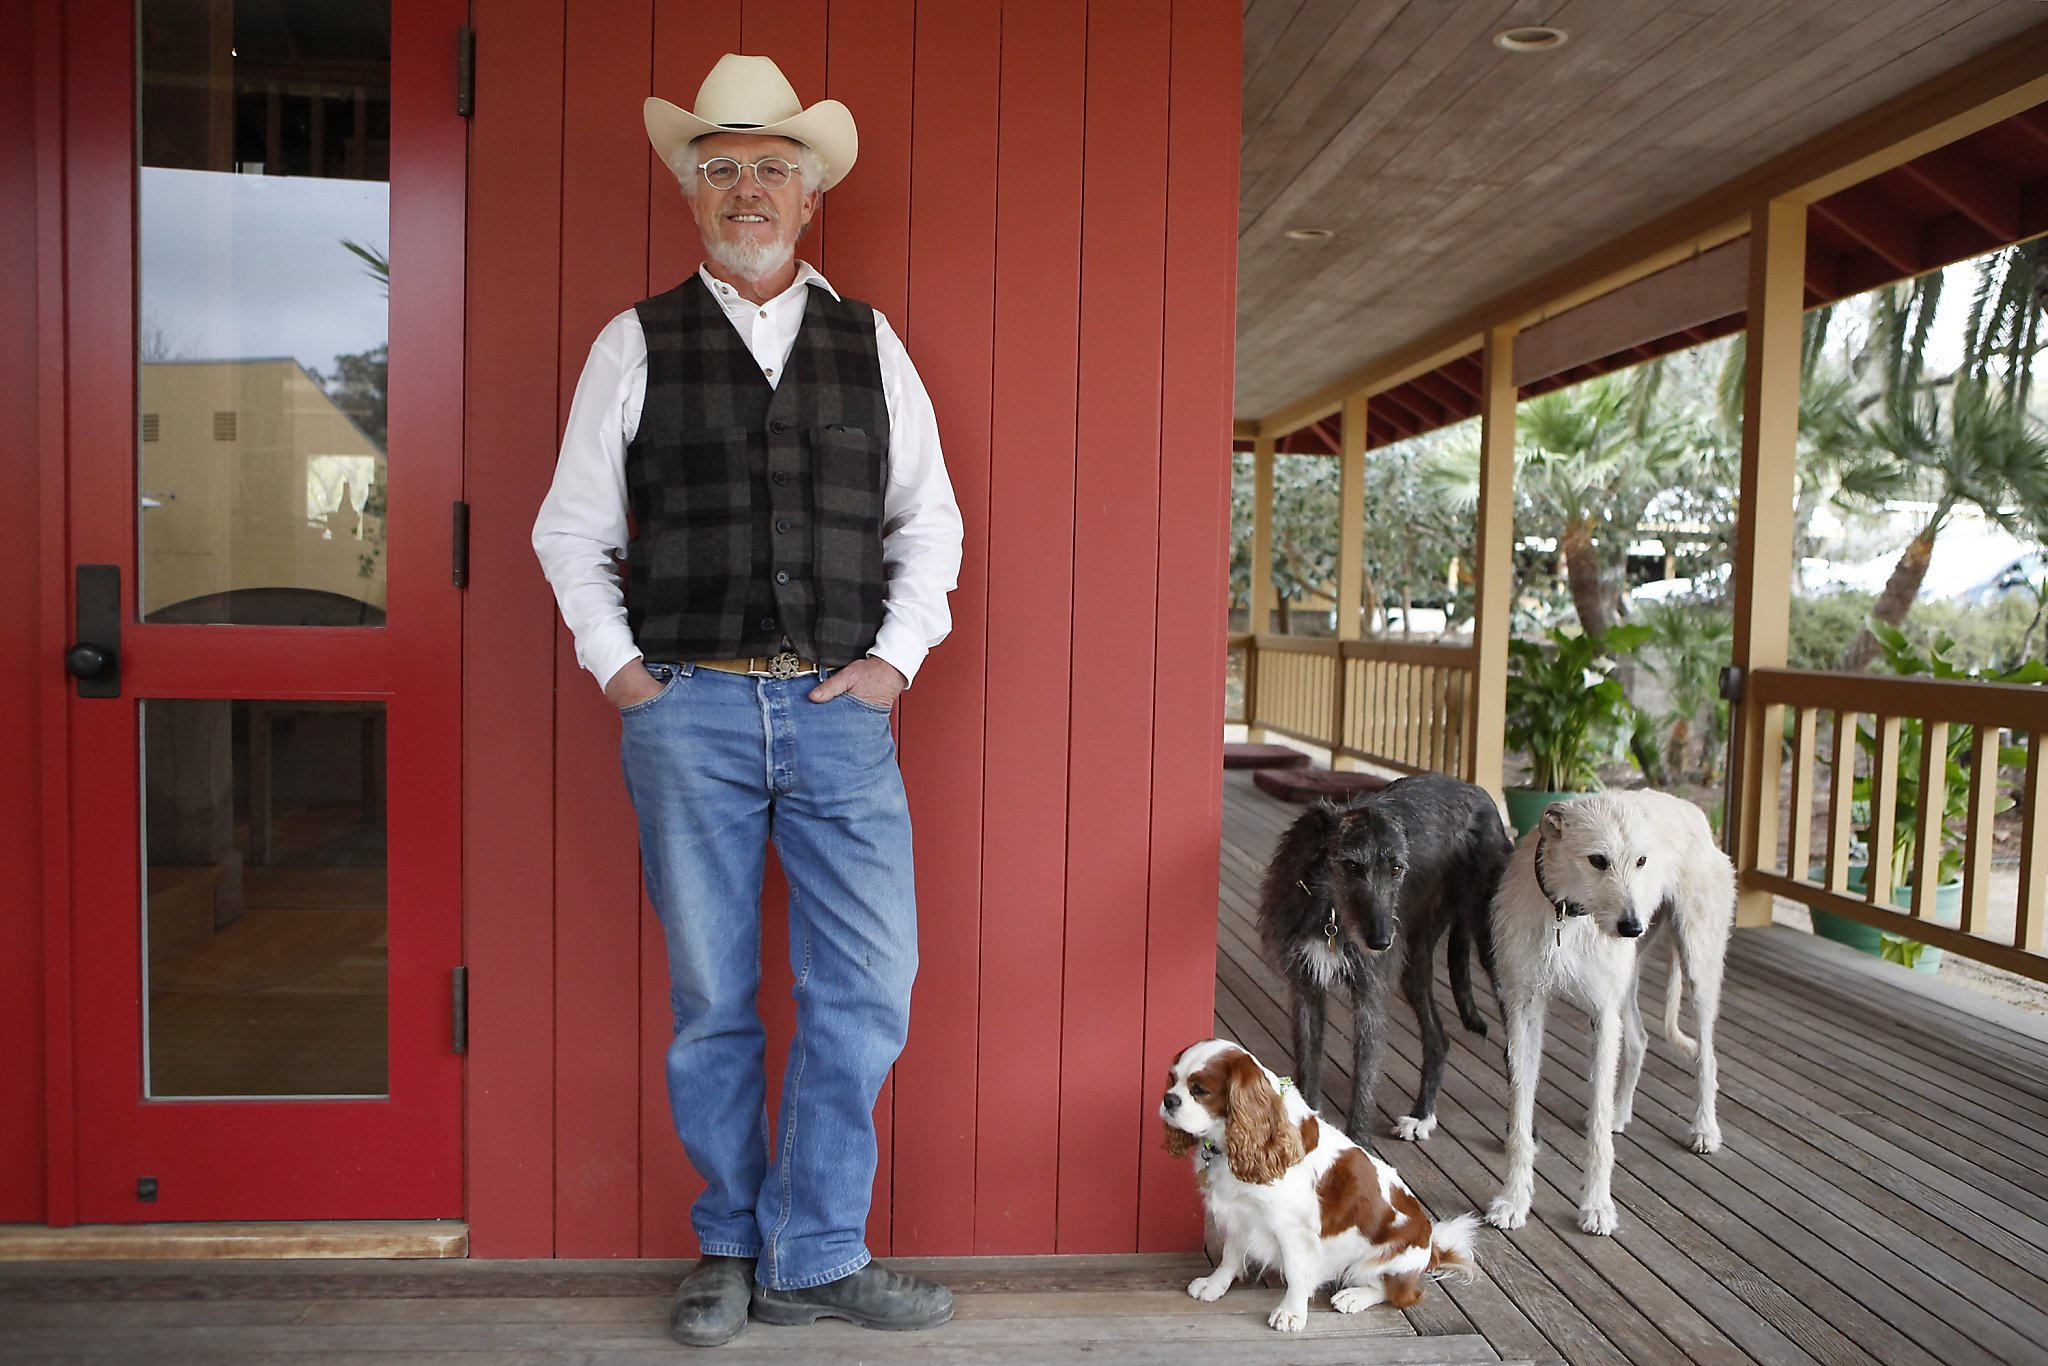 Lee Hudson Napa s gentleman farmer who does it all SFGate